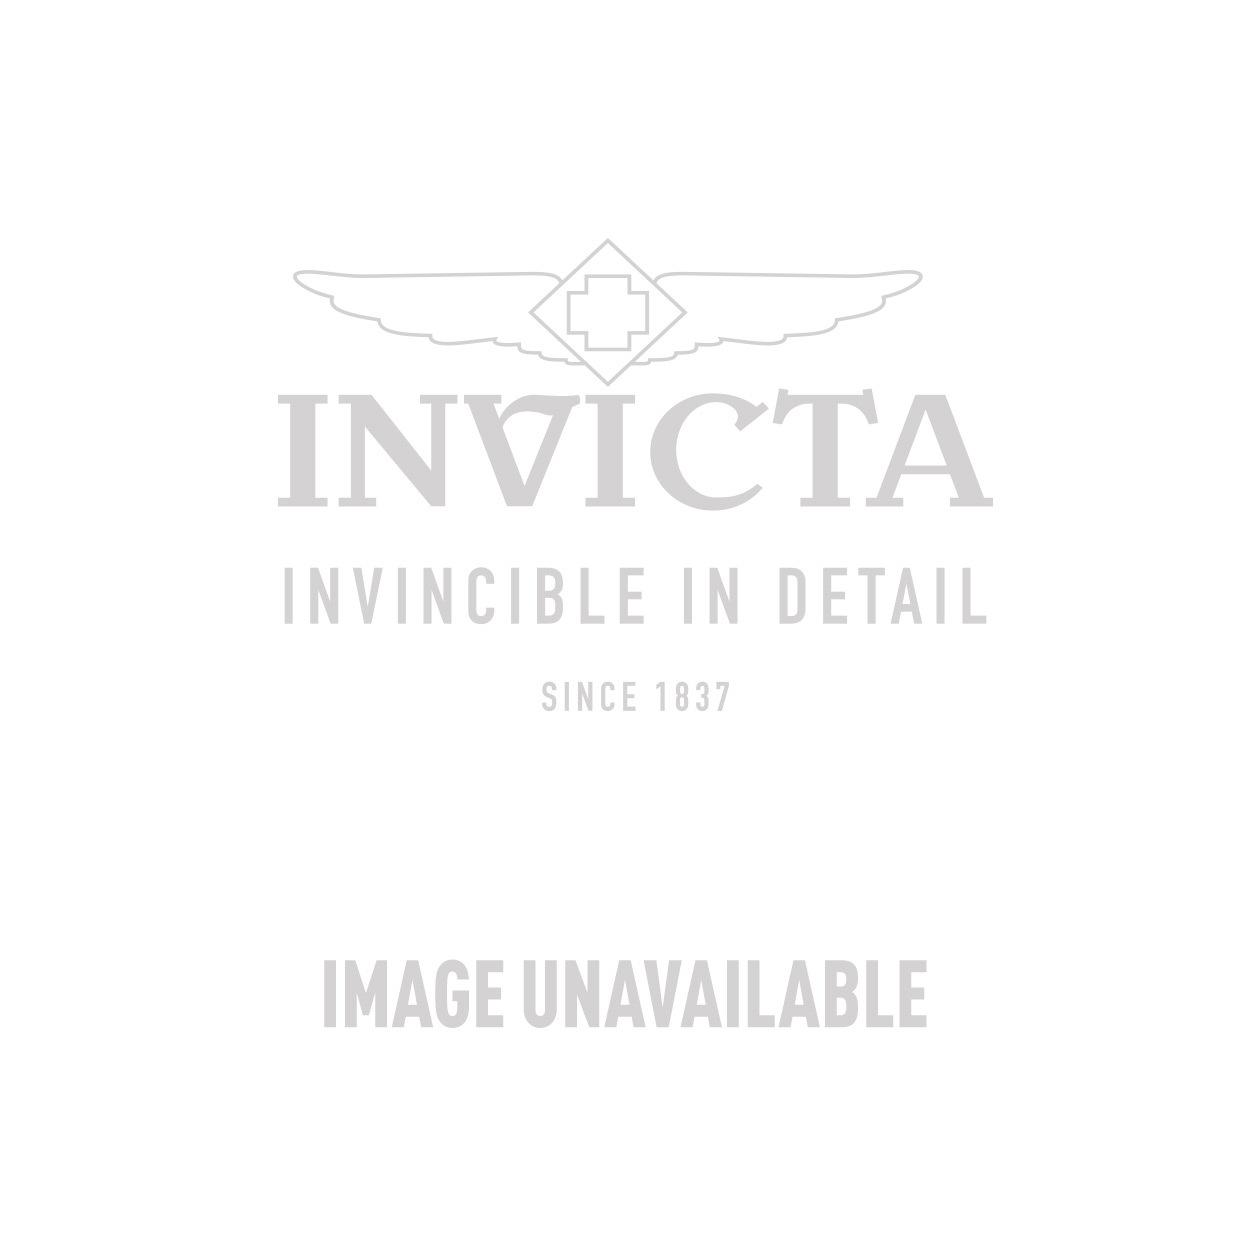 Invicta I-Force Quartz Watch - Rose Gold, Black case with Black tone Silicone band - Model 16911